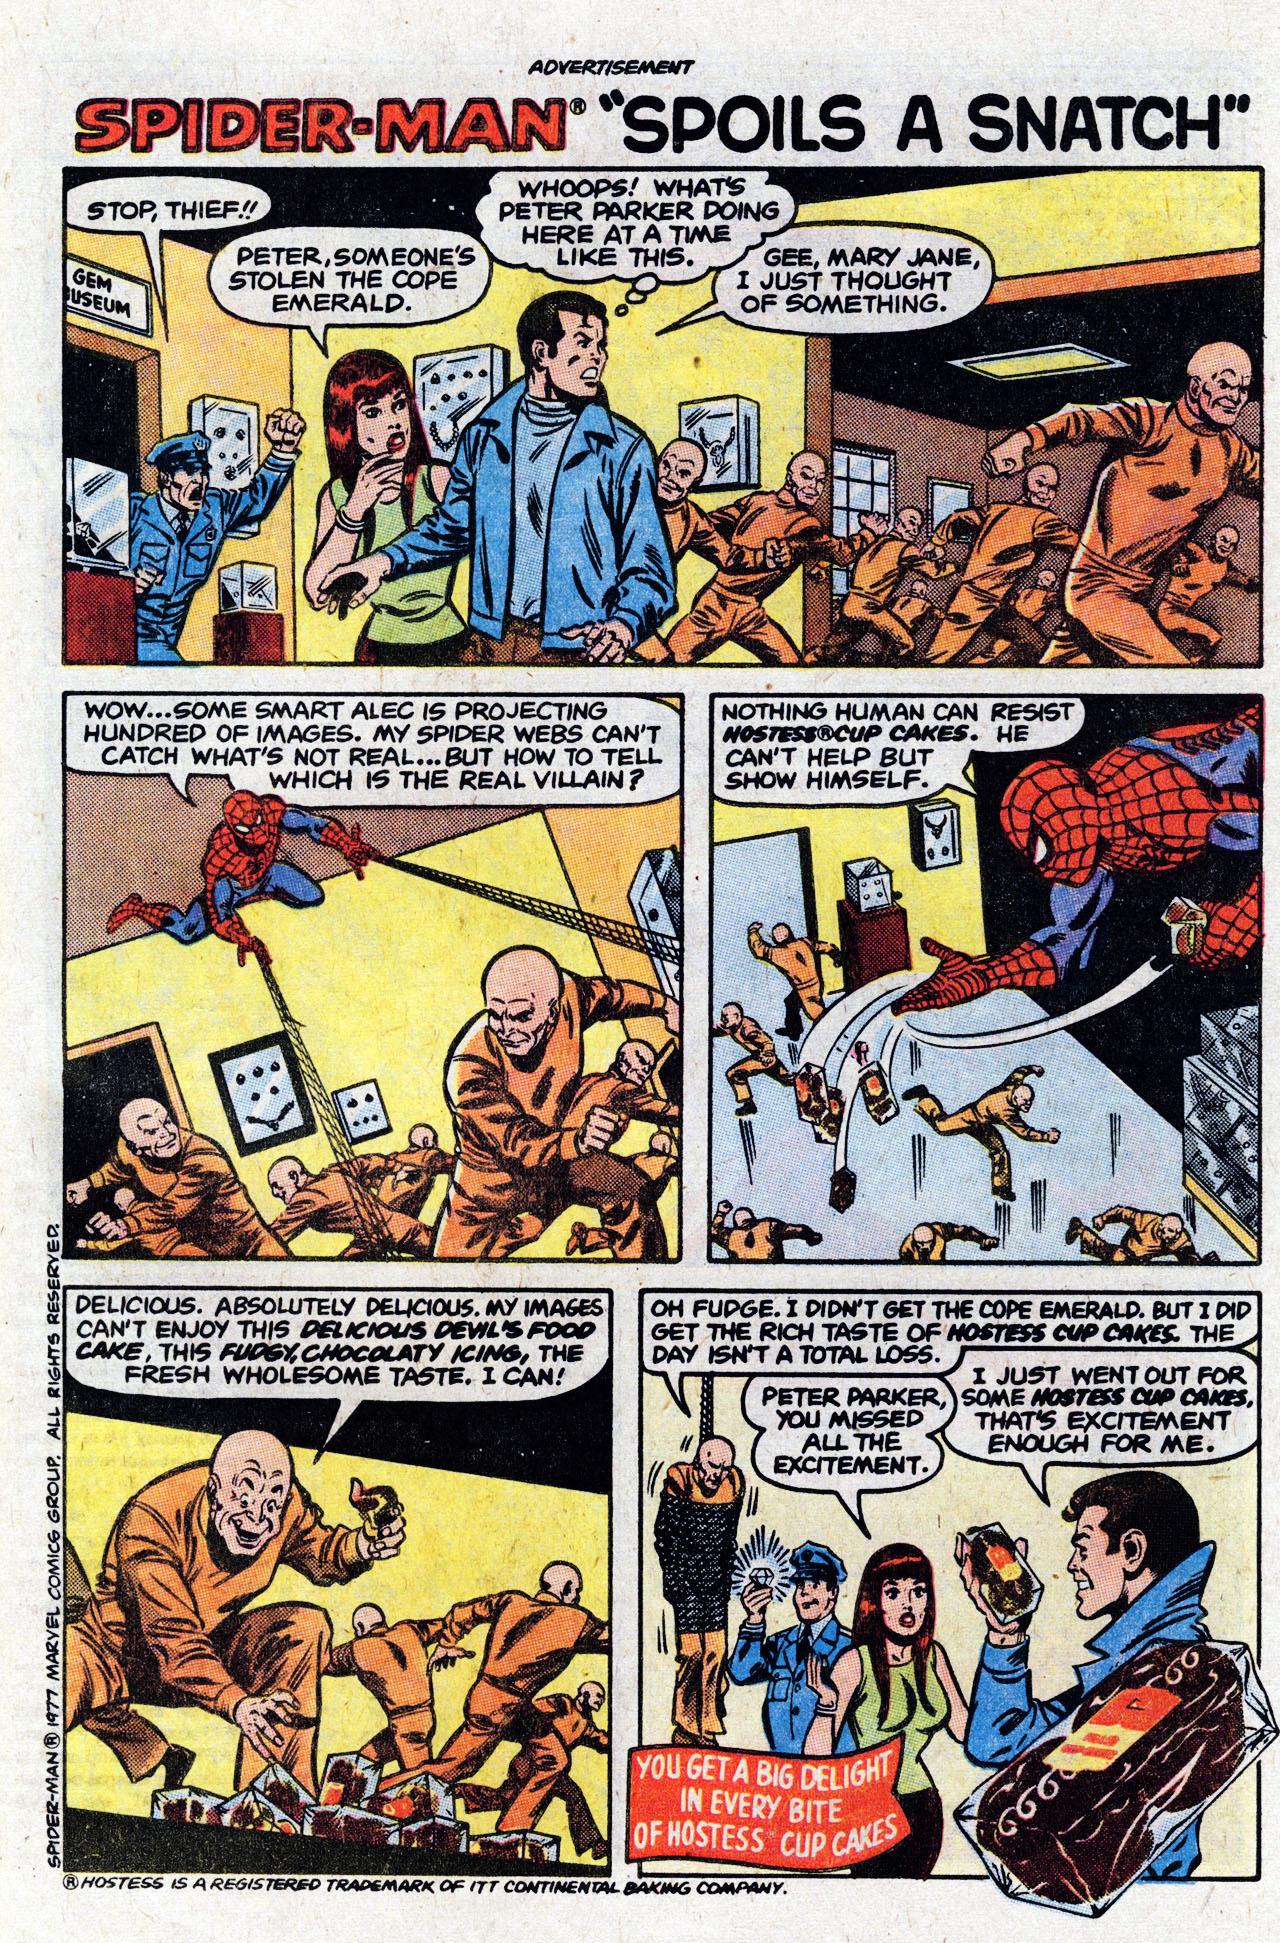 I017 SPIDER-MAN CITY AT WAR #1 US-COMIC OF 6 - MARVEL COMIC USA